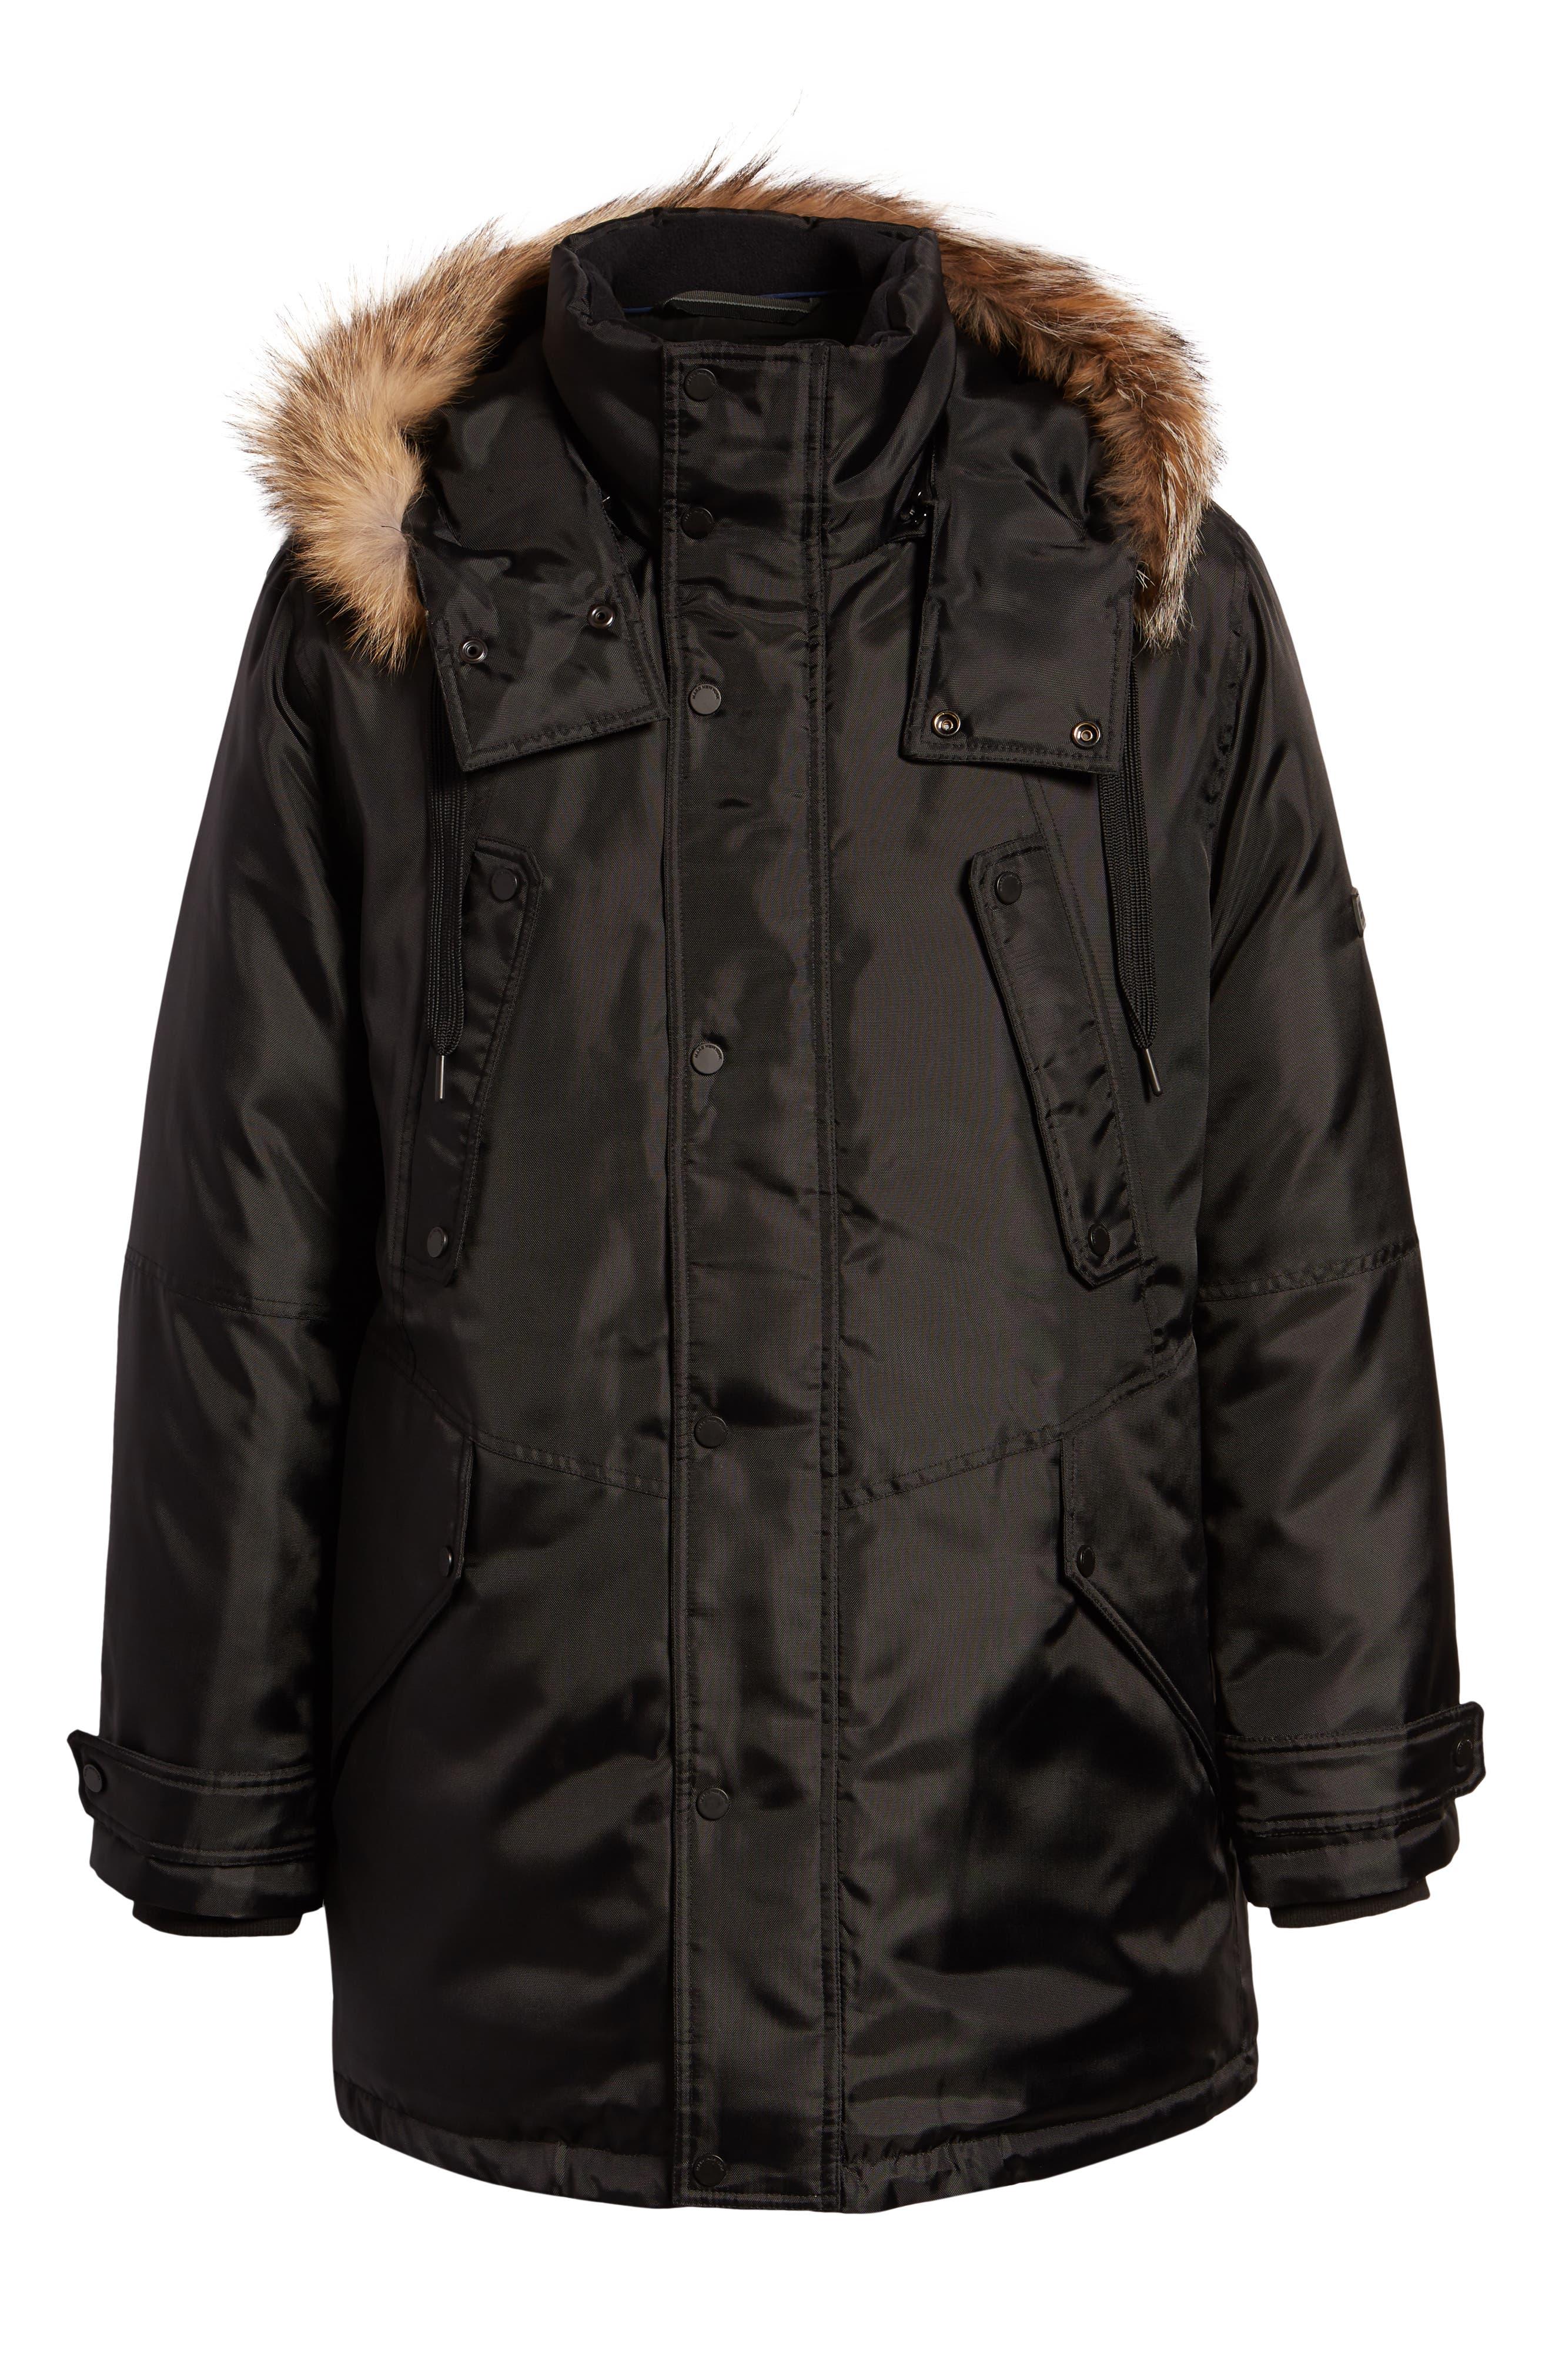 MARC NEW YORK, Lafayette Genuine Fur Trim Hooded Parka, Alternate thumbnail 6, color, BLACK